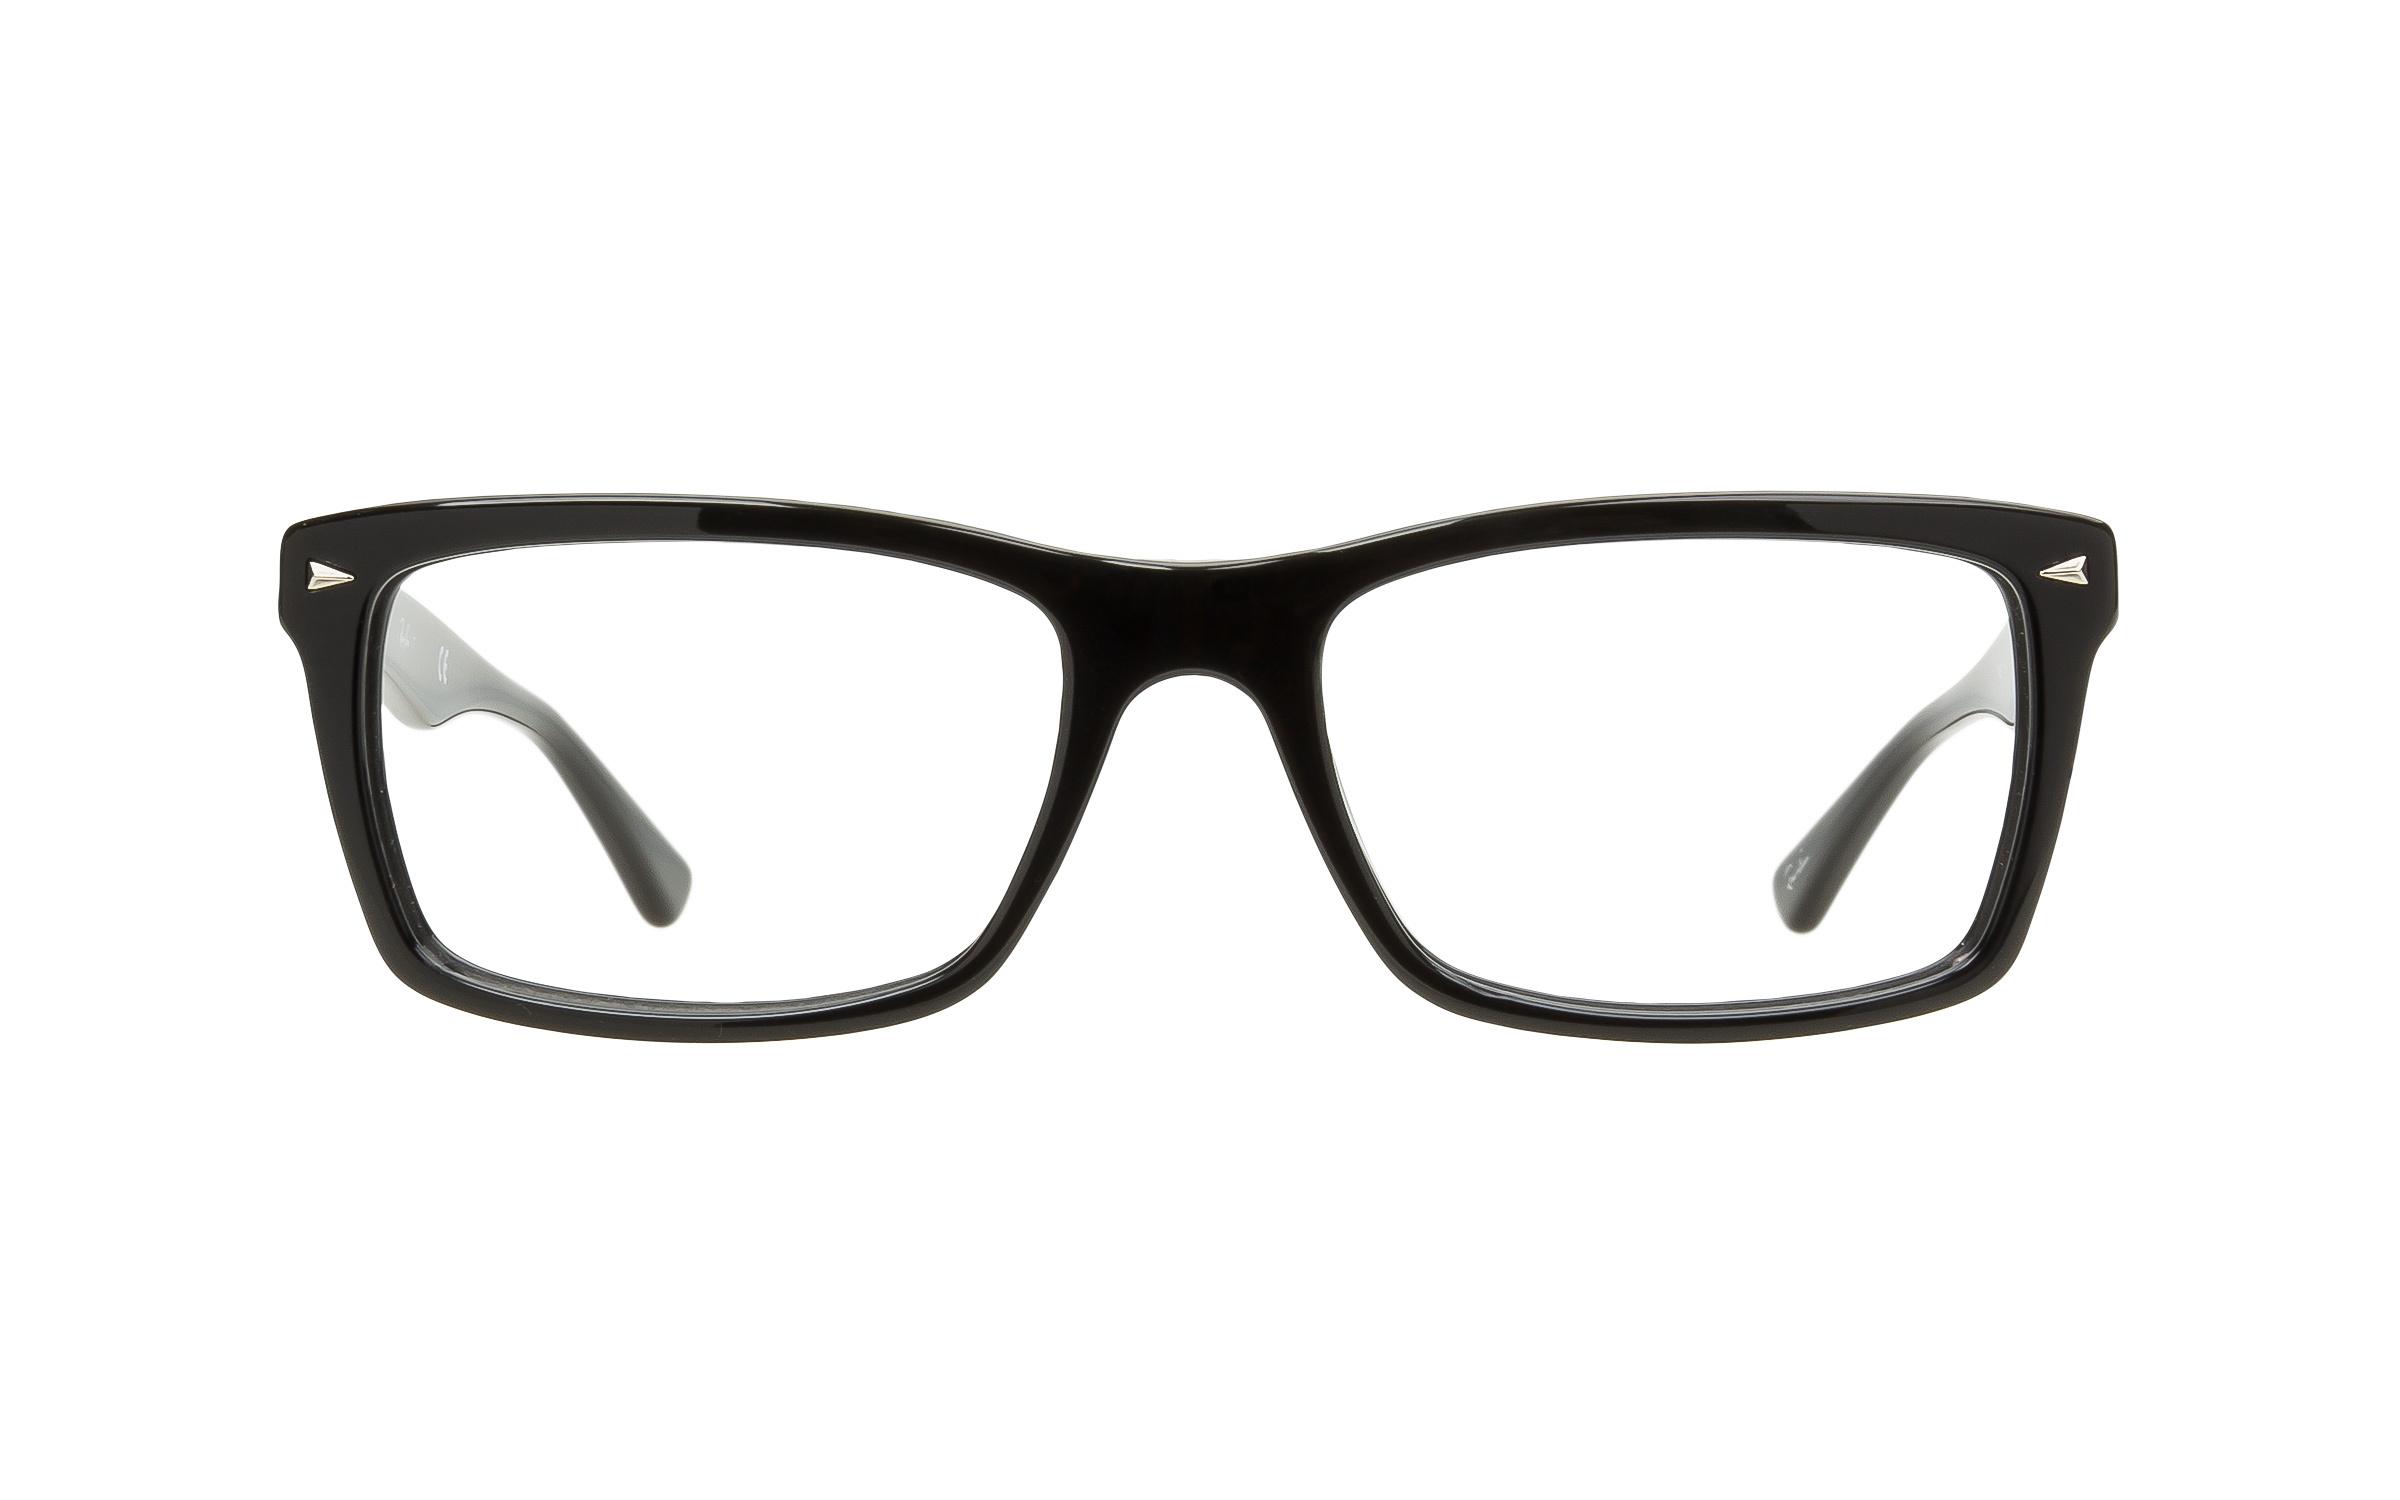 http://www.coastal.com/ - Luxottica Ray-Ban RB5287 2000 Eyeglasses and Frame in Black – Online Coastal